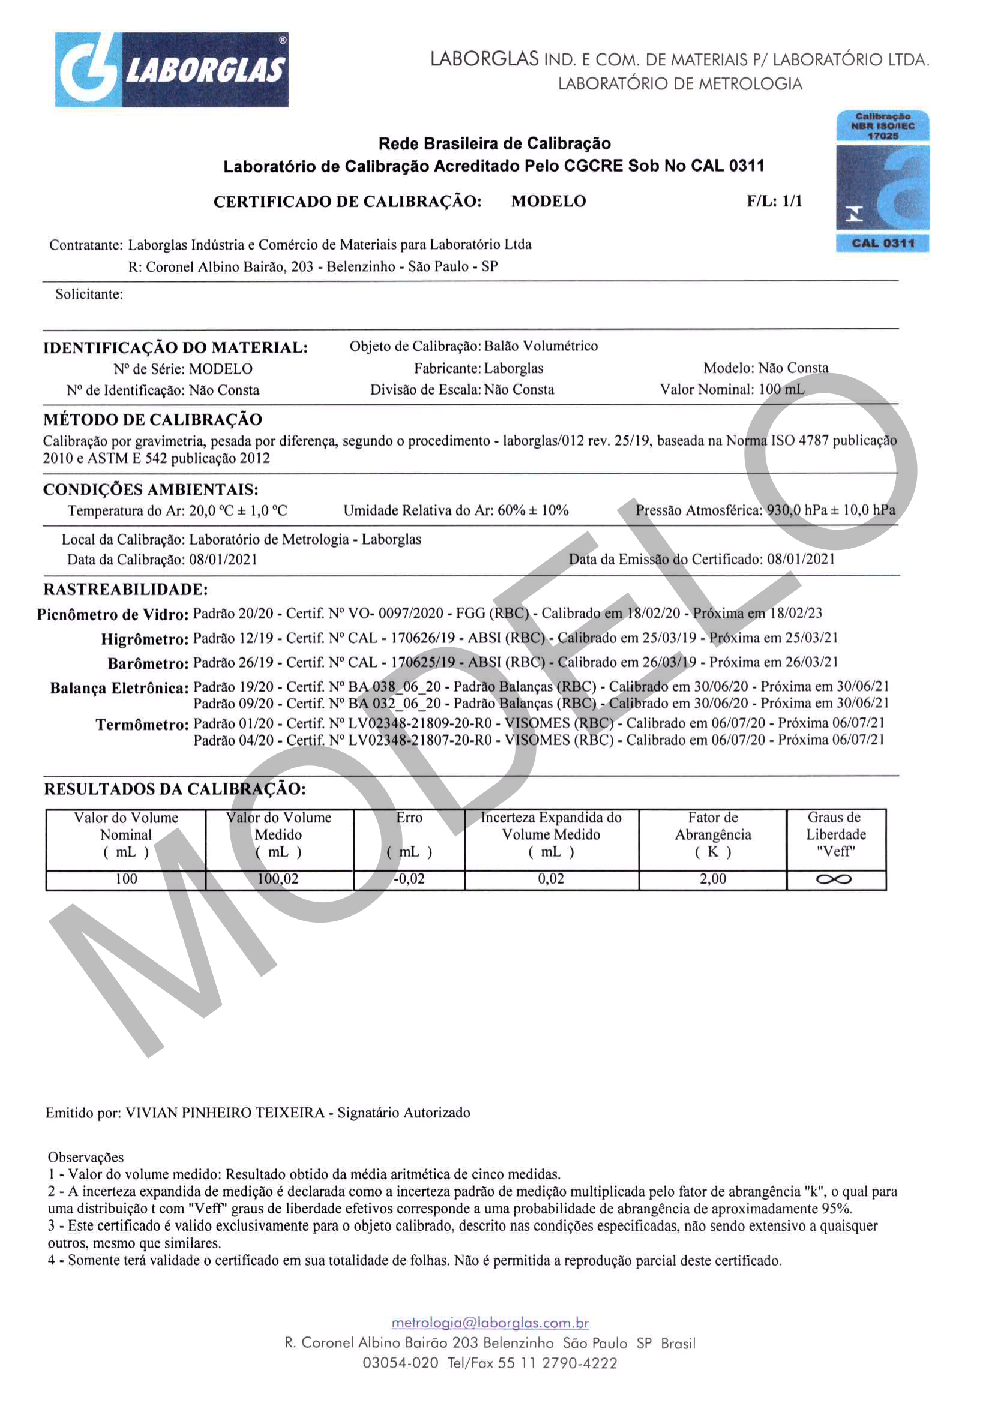 BALÃO VOLUMÉTRICO CLASSE A ROLHA POLI C/ CERTIFICADO RBC 4000 ML - Marca Laborglas - Cód. 9167871-R